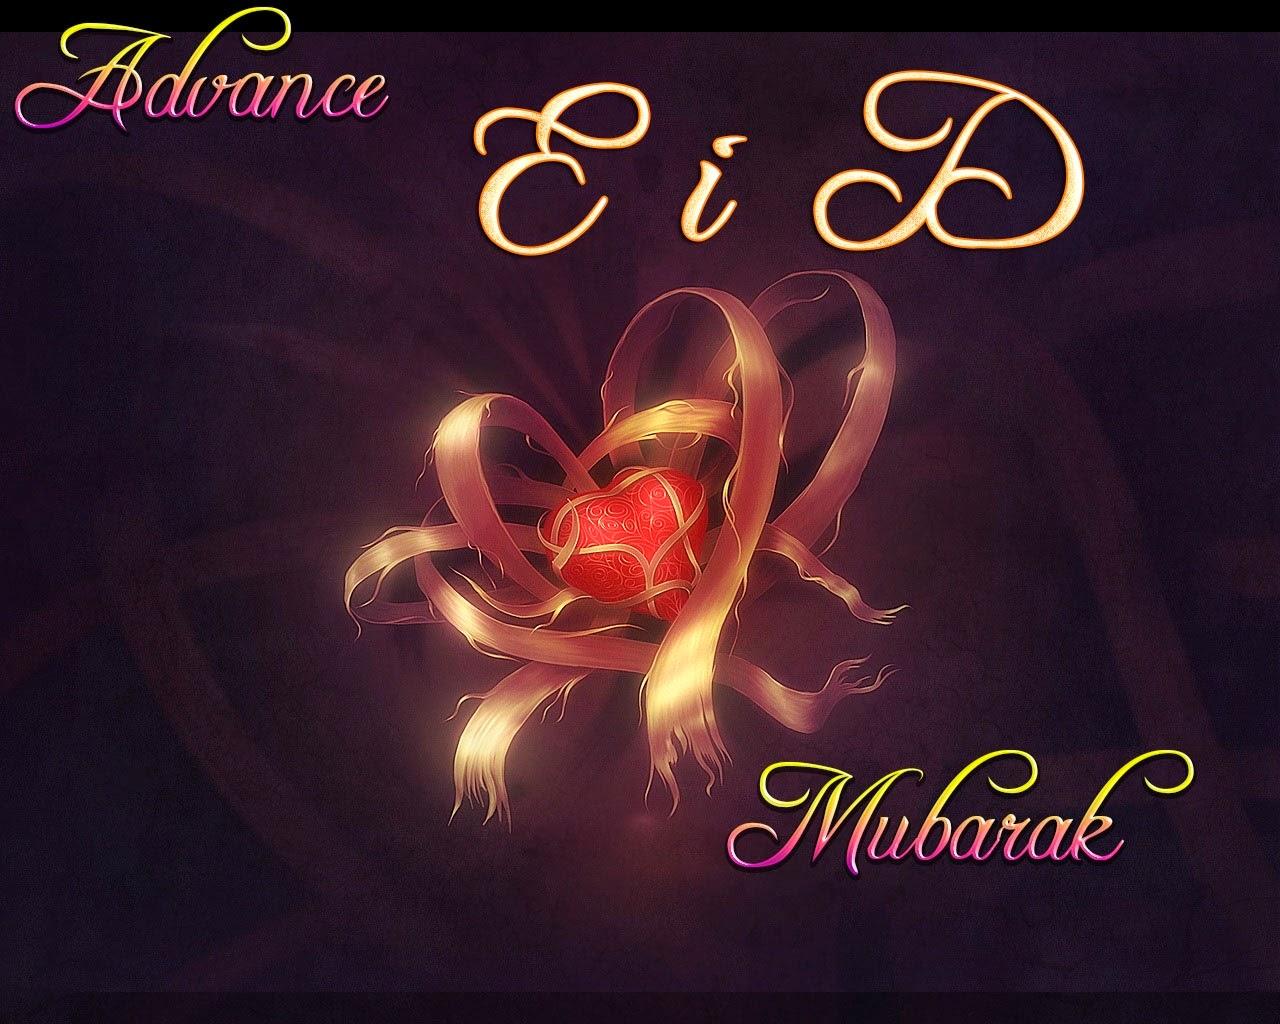 Beautiful Eod Eid Al-Fitr Greeting - advance-eid-mubarak-wishes-greetings-cards-ecards-images-03  Photograph_59100100 .jpg